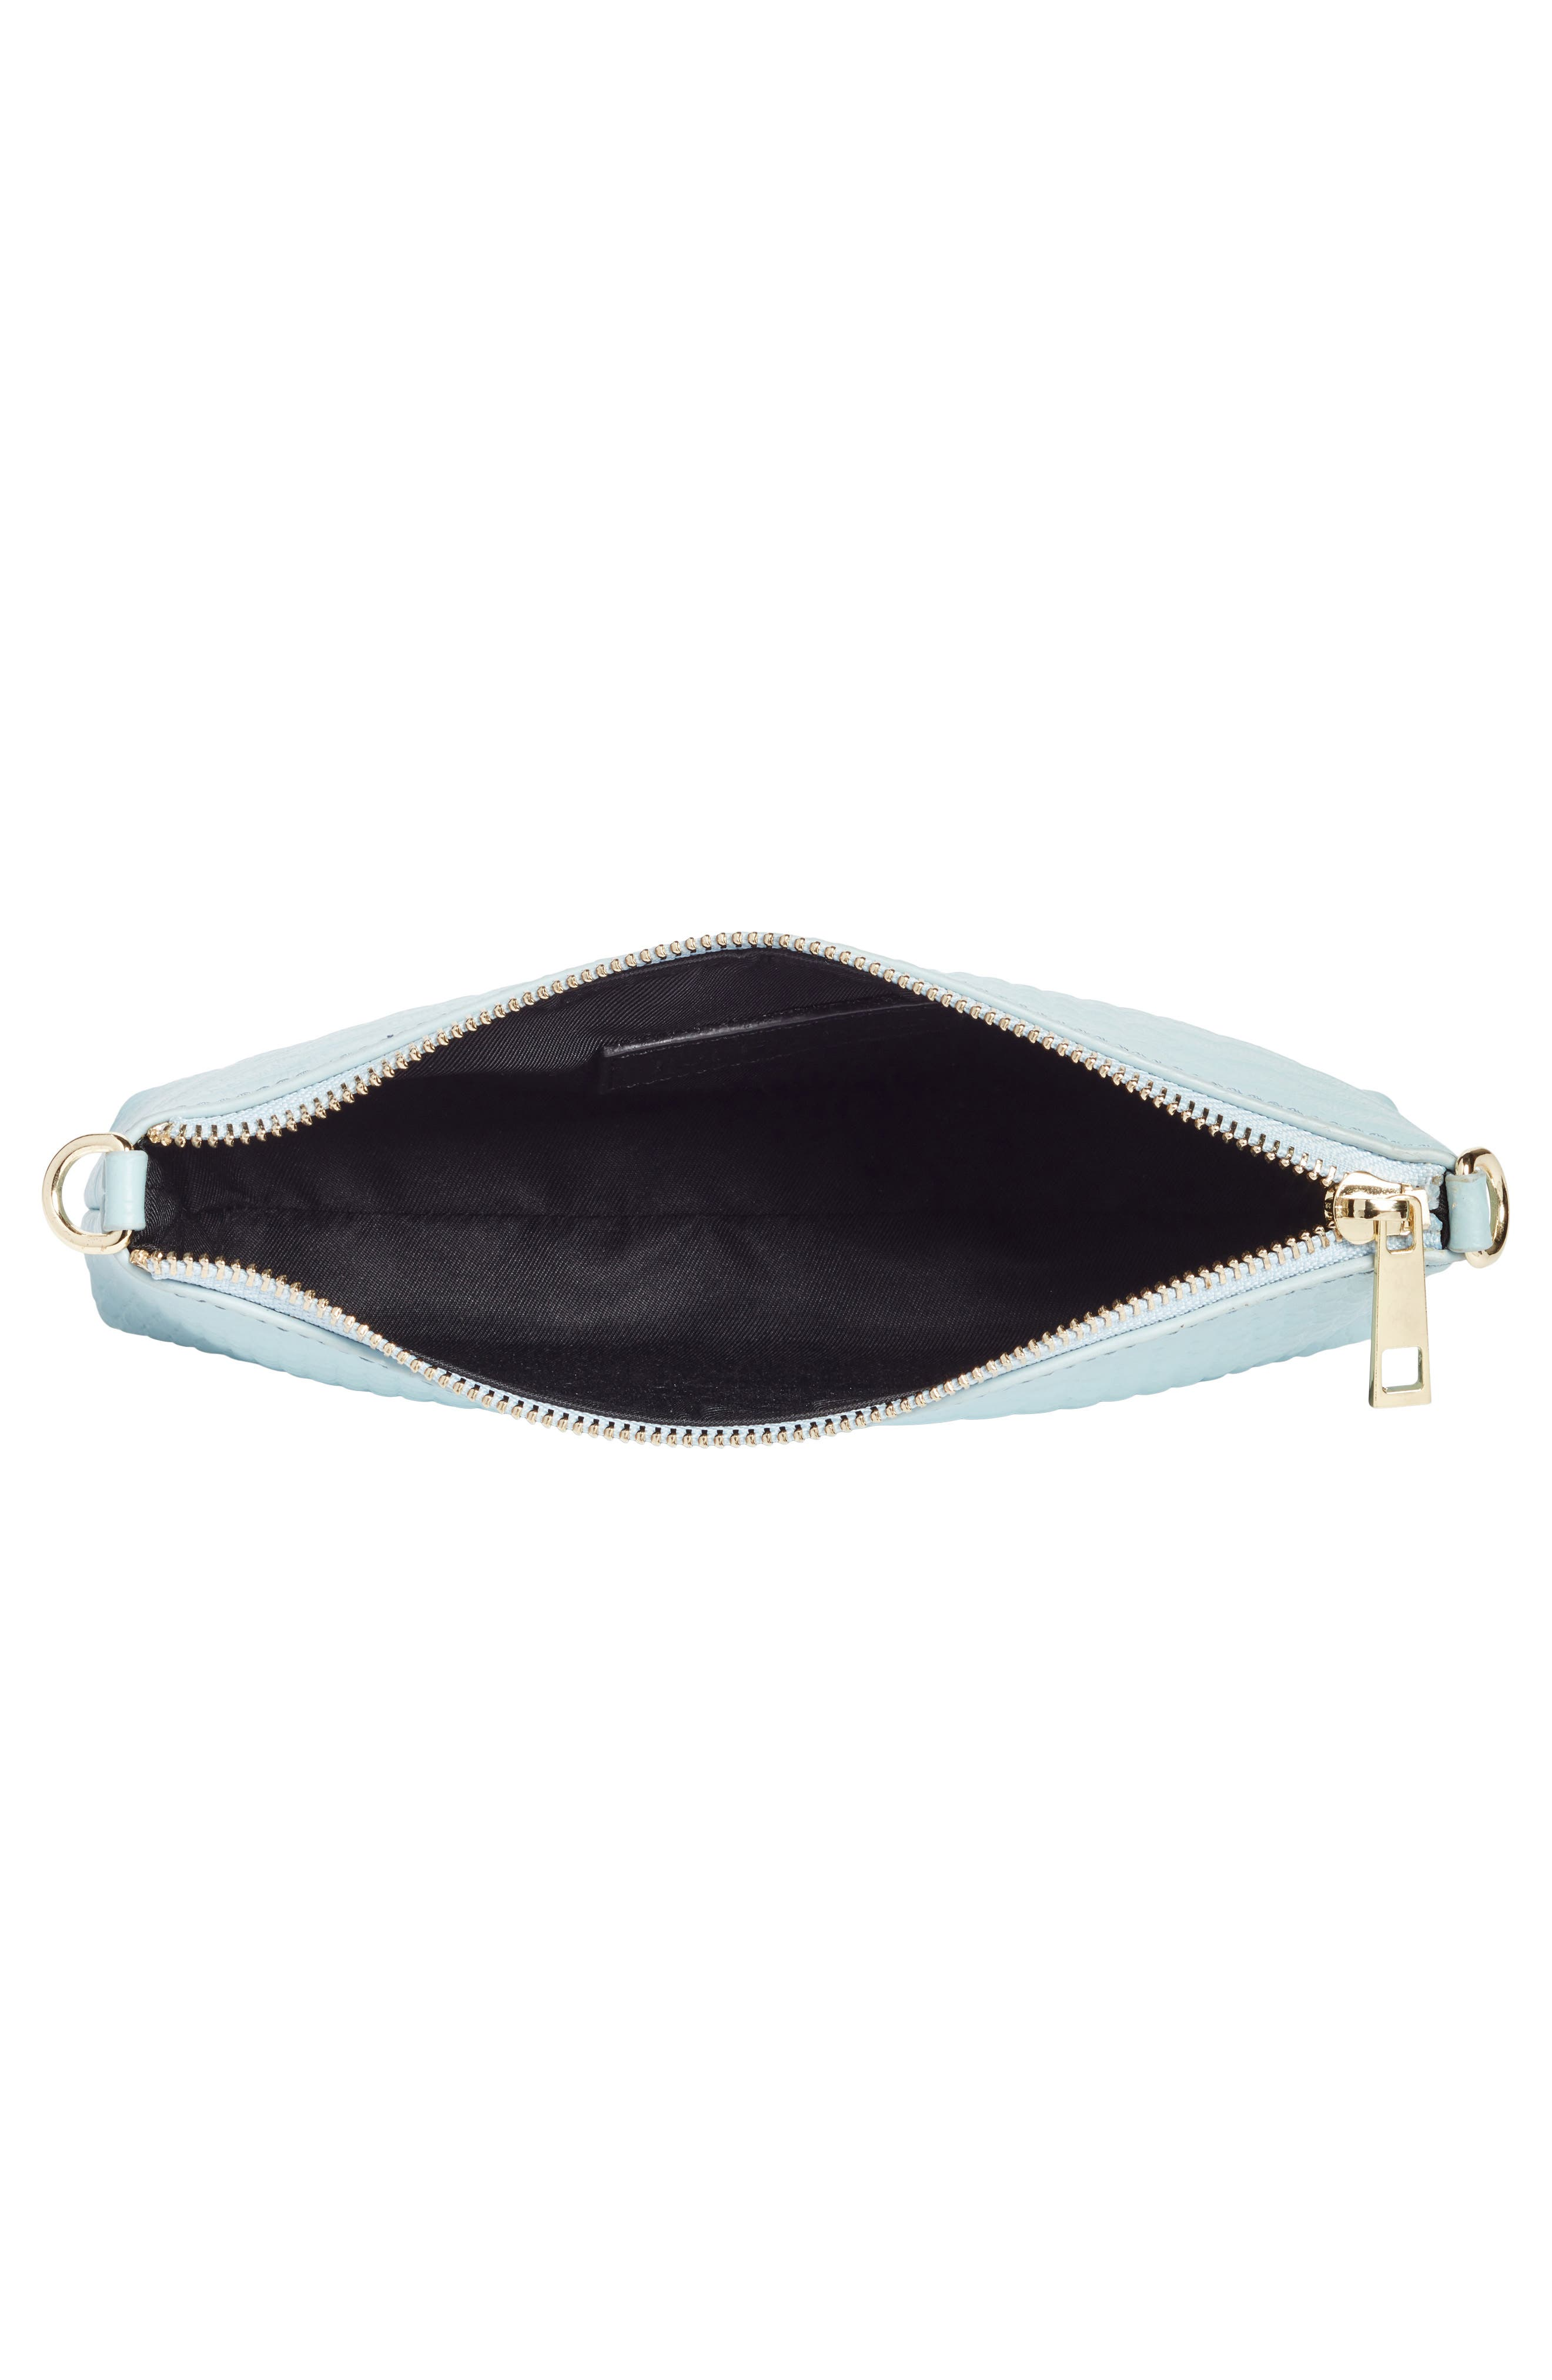 Lola Textured Faux Leather Crossbody Bag,                             Alternate thumbnail 7, color,